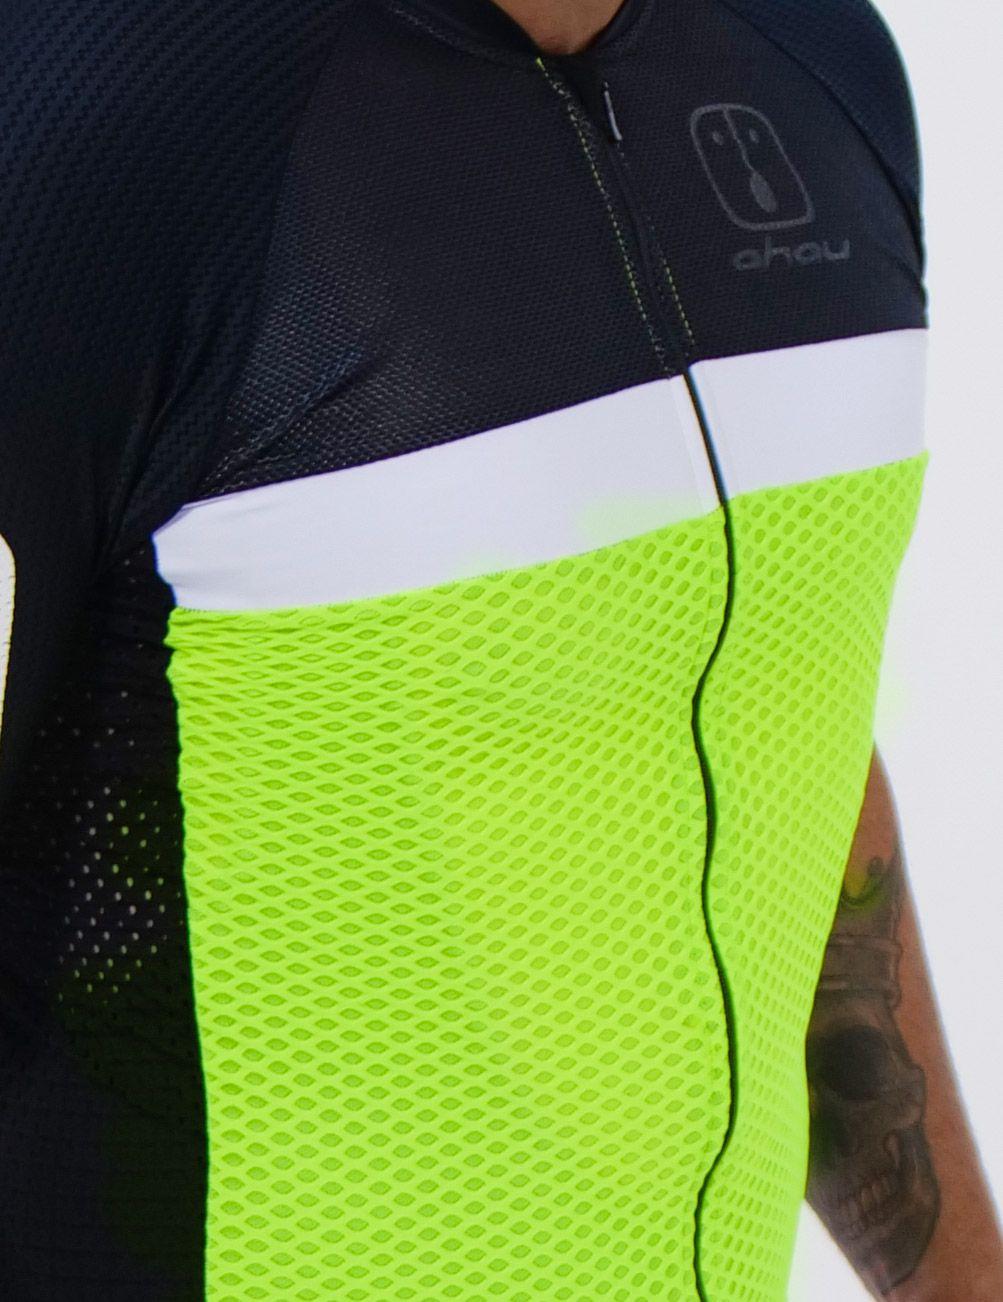 Camisa Ciclismo Label Neon SKIN - Feminina